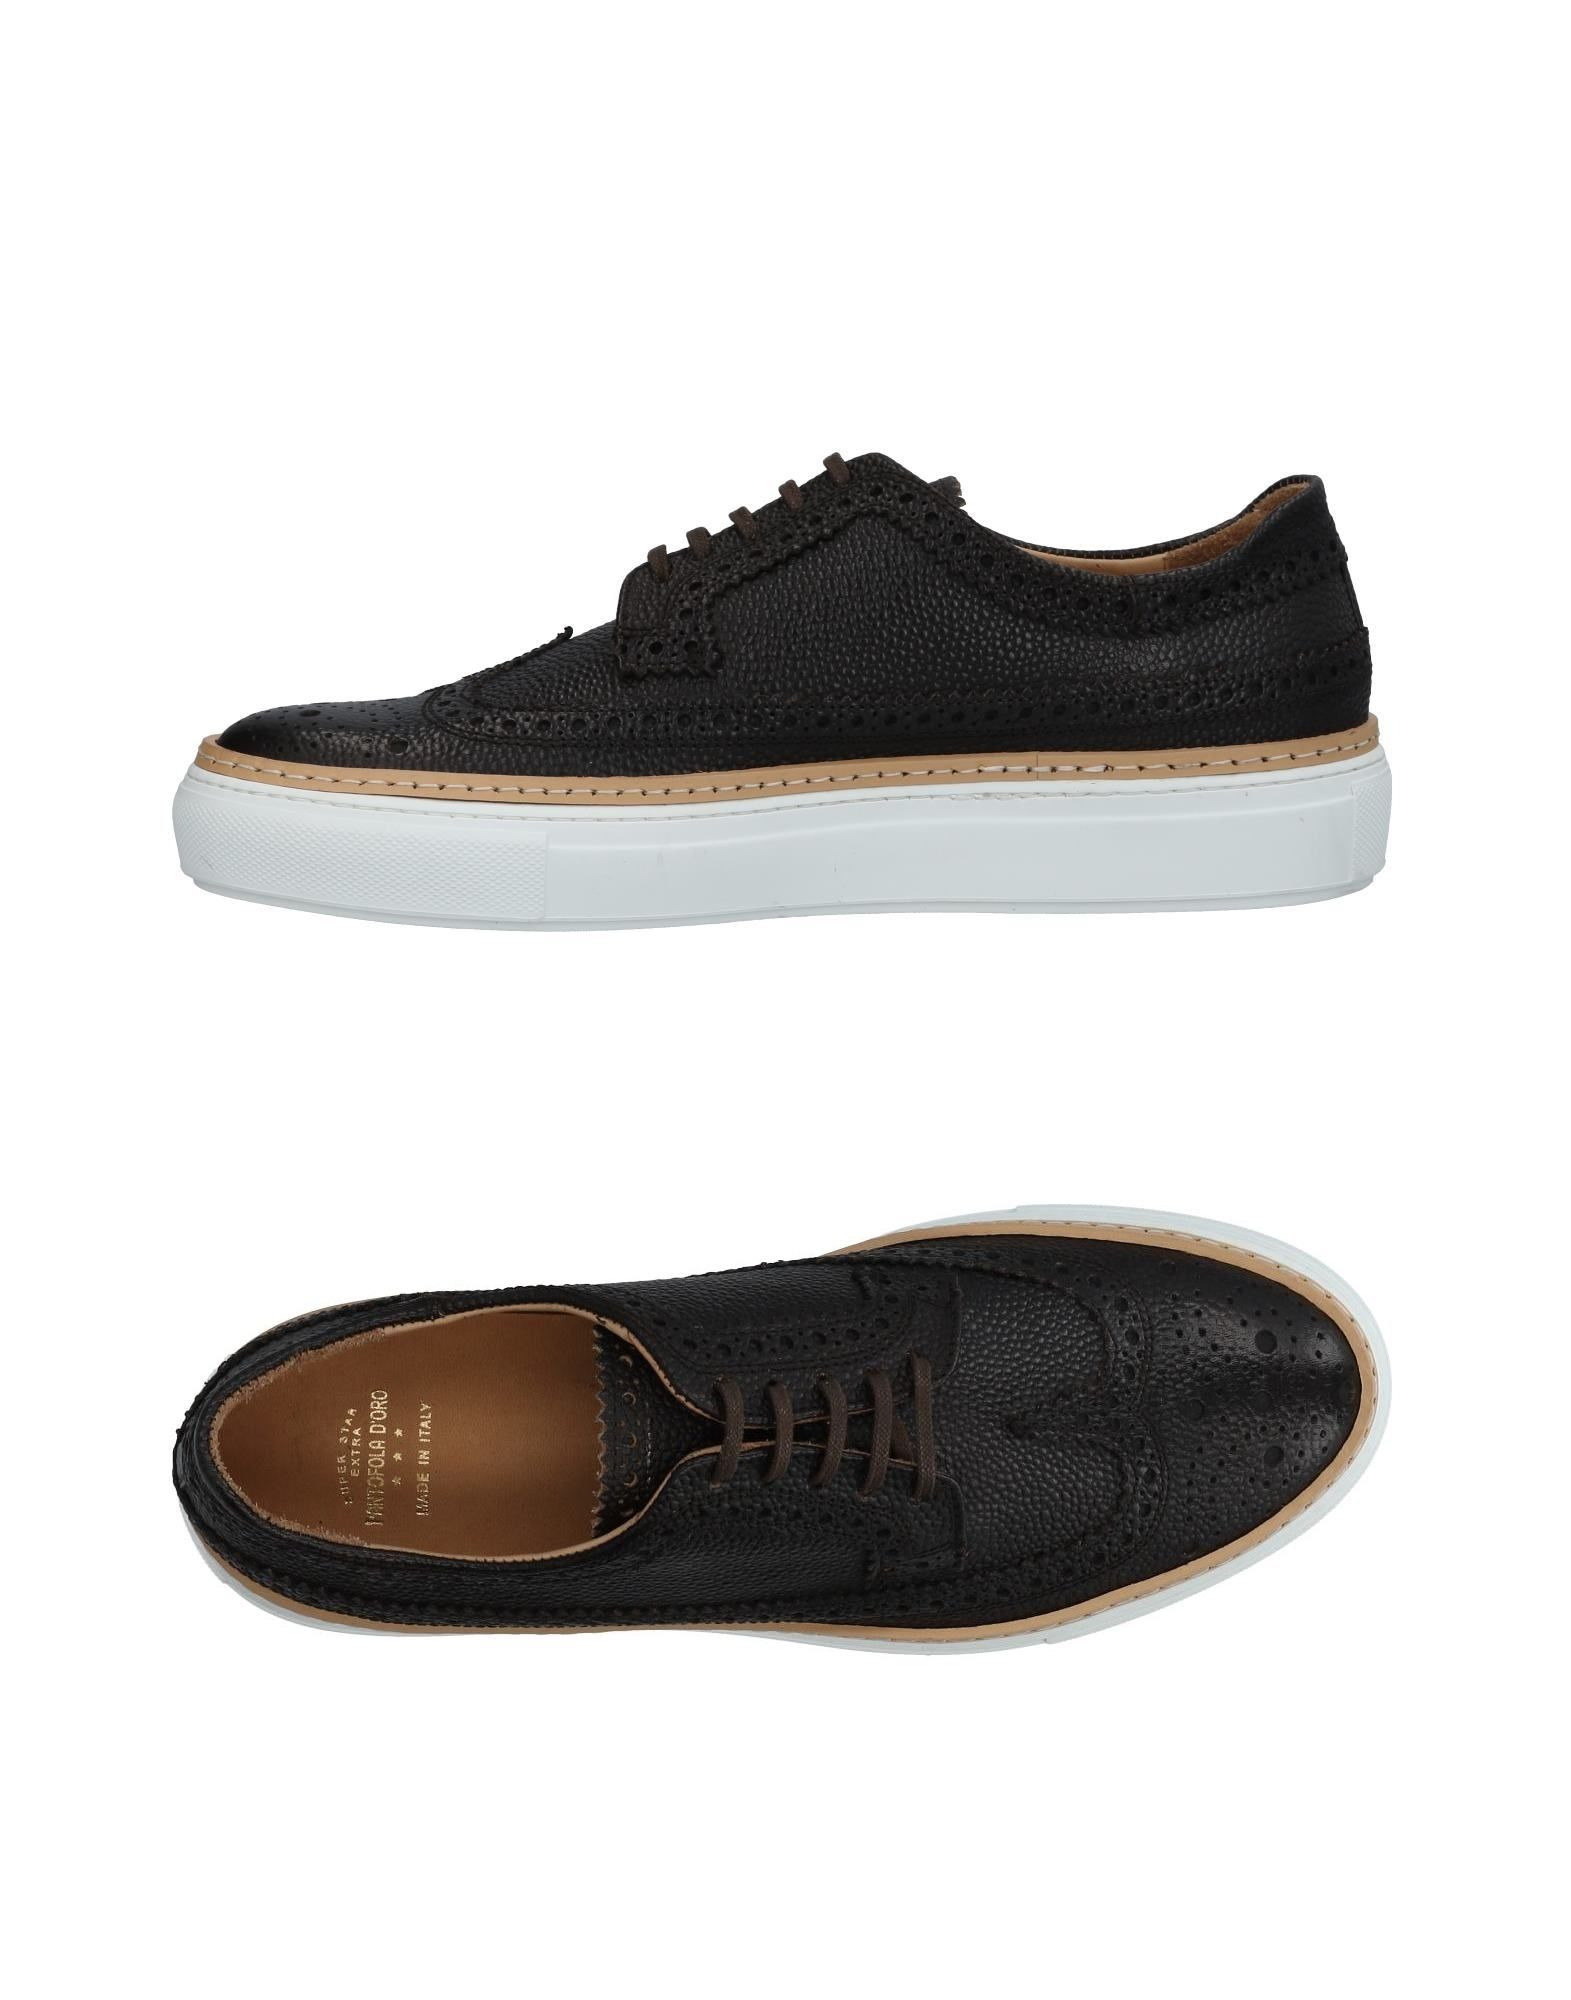 Rabatt echte Schuhe Pantofola D'oro Schnürschuhe Herren  11455731QN